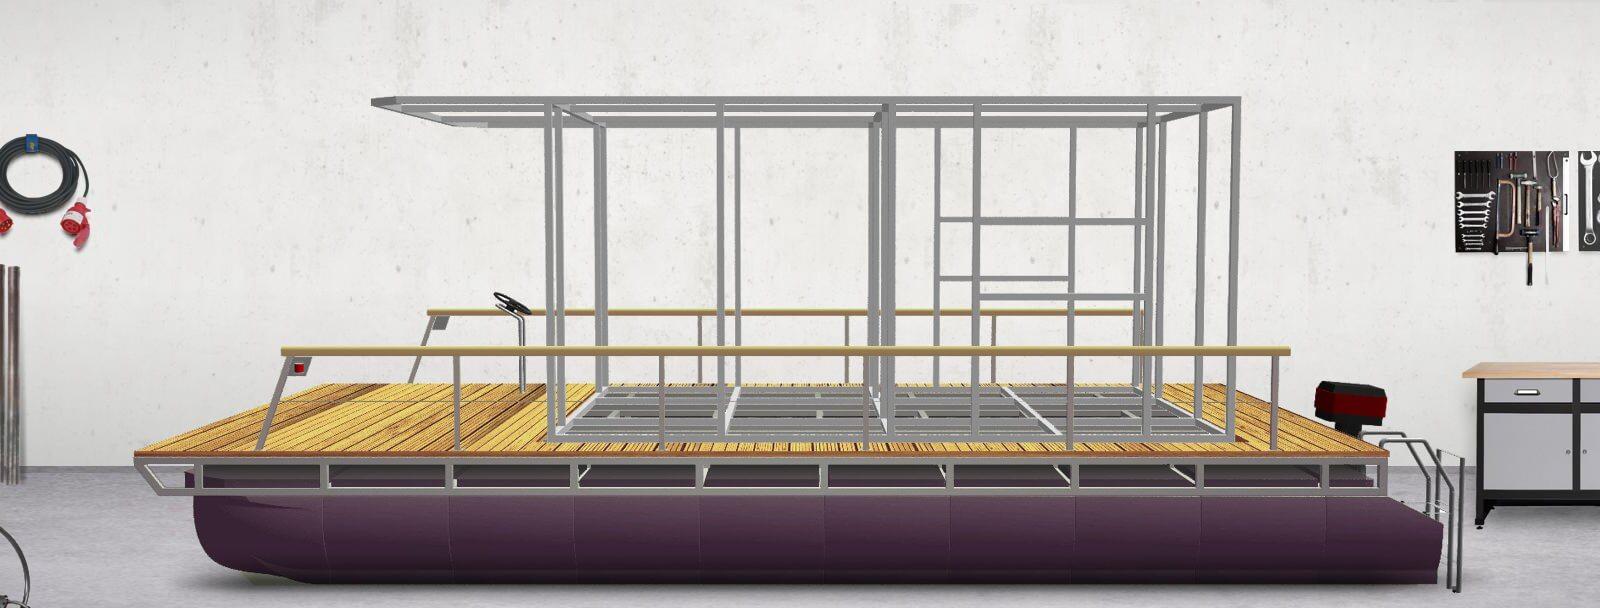 Pontoon platform with house framework